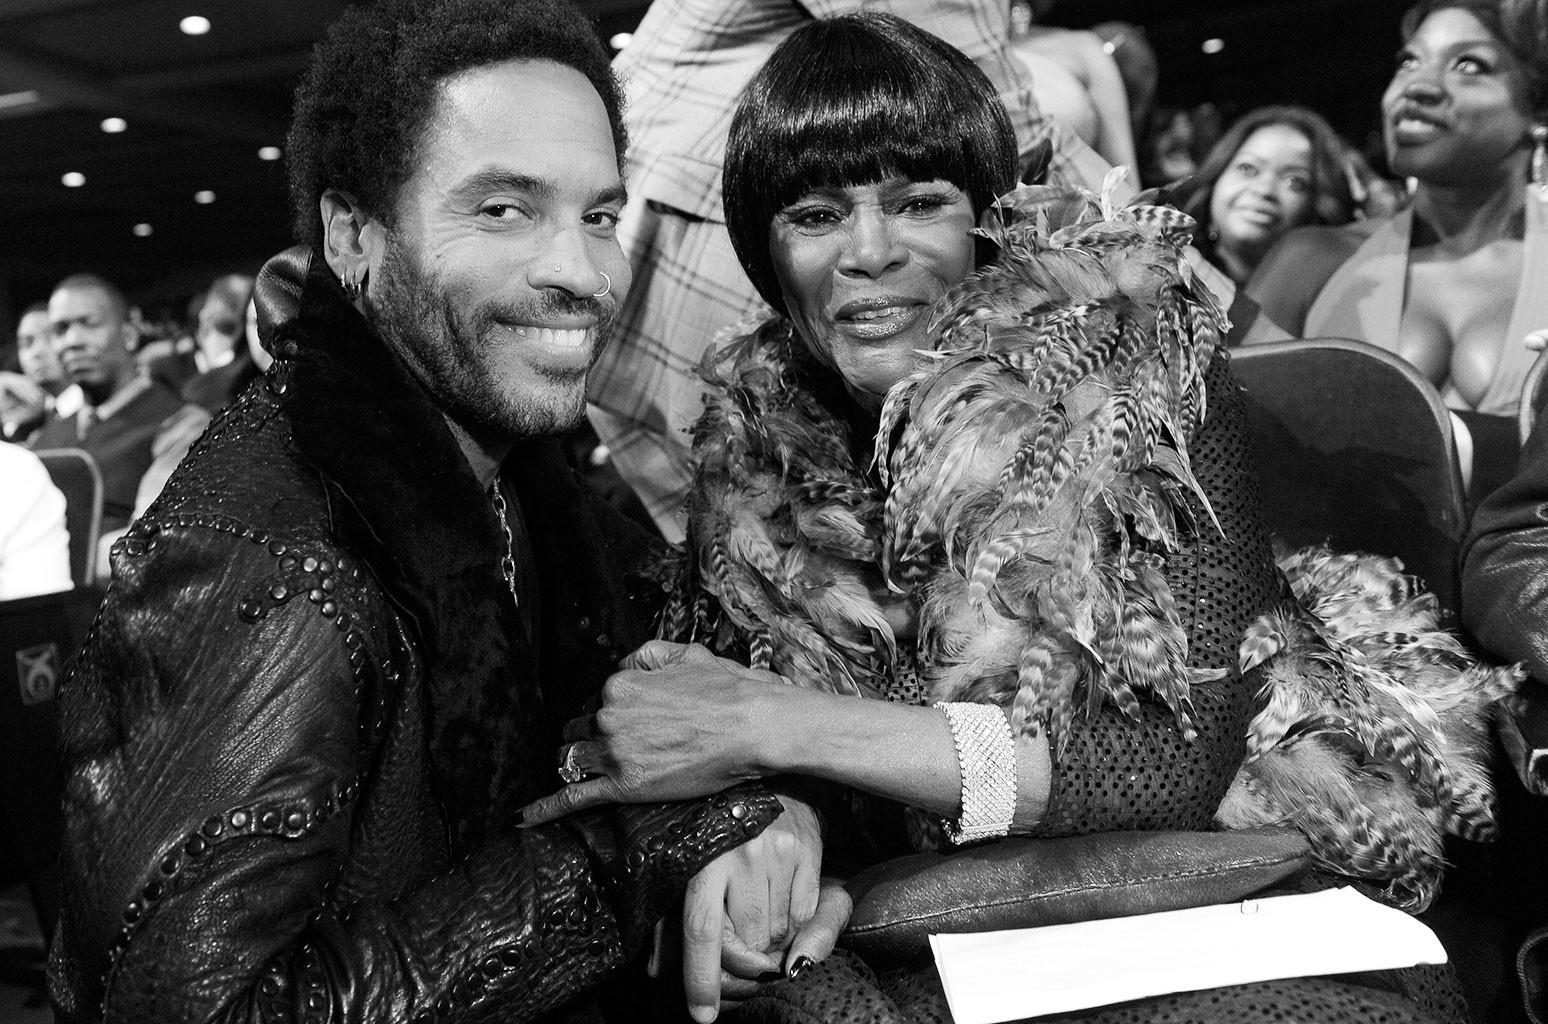 Lenny Kravitz and Cicely Tyson